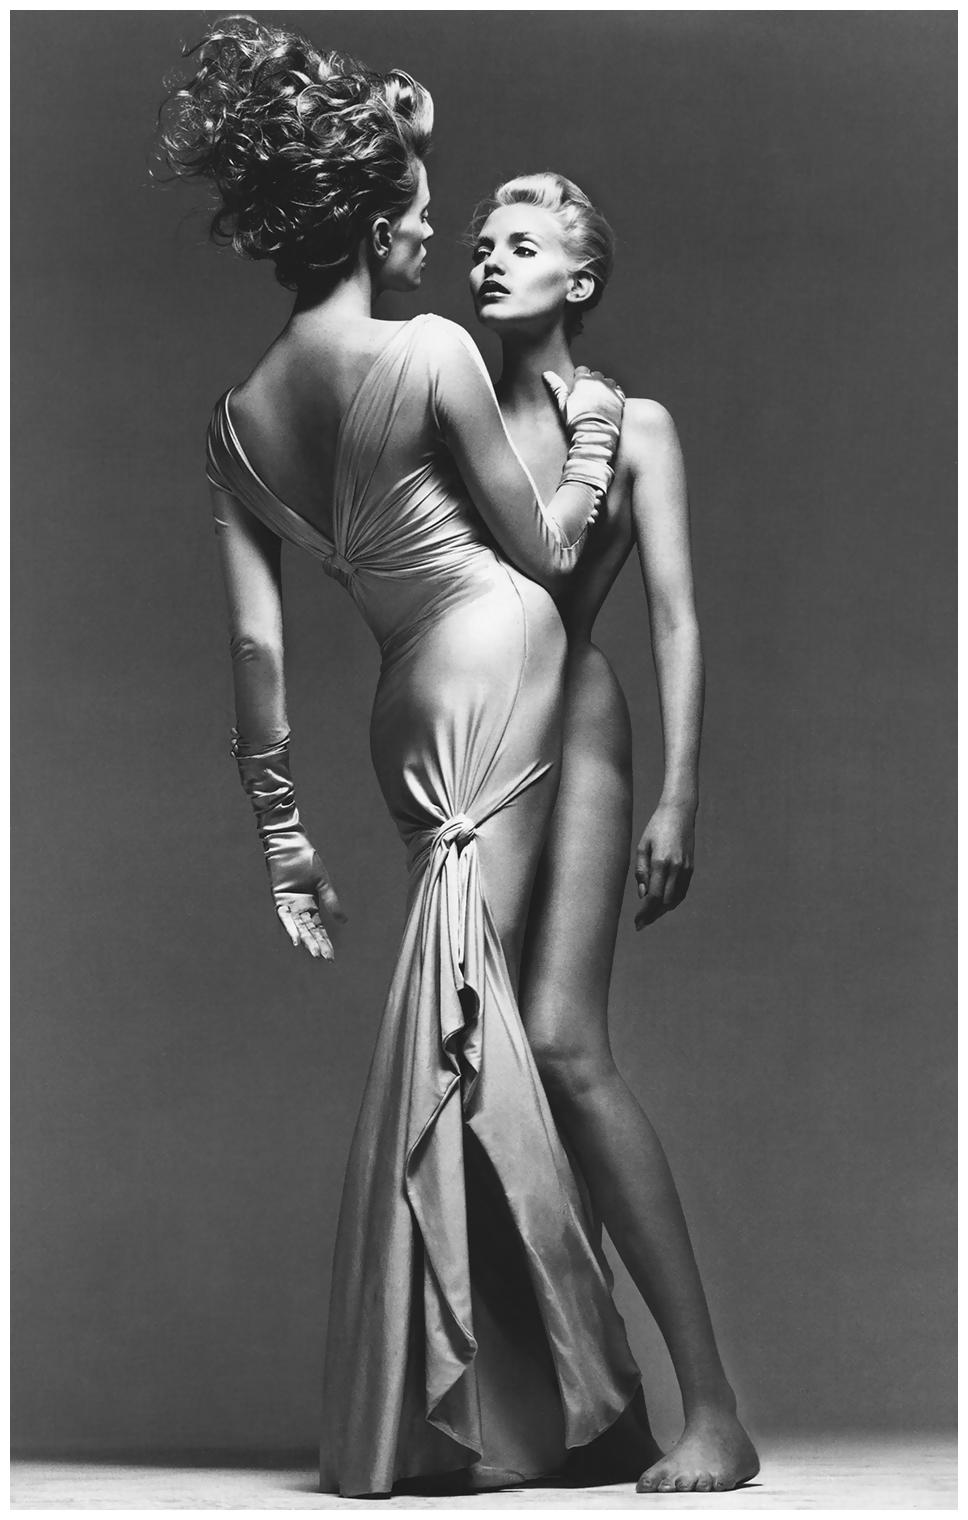 models-nadja-auermann-kristen-mcmenamy-richard-avedon-1995